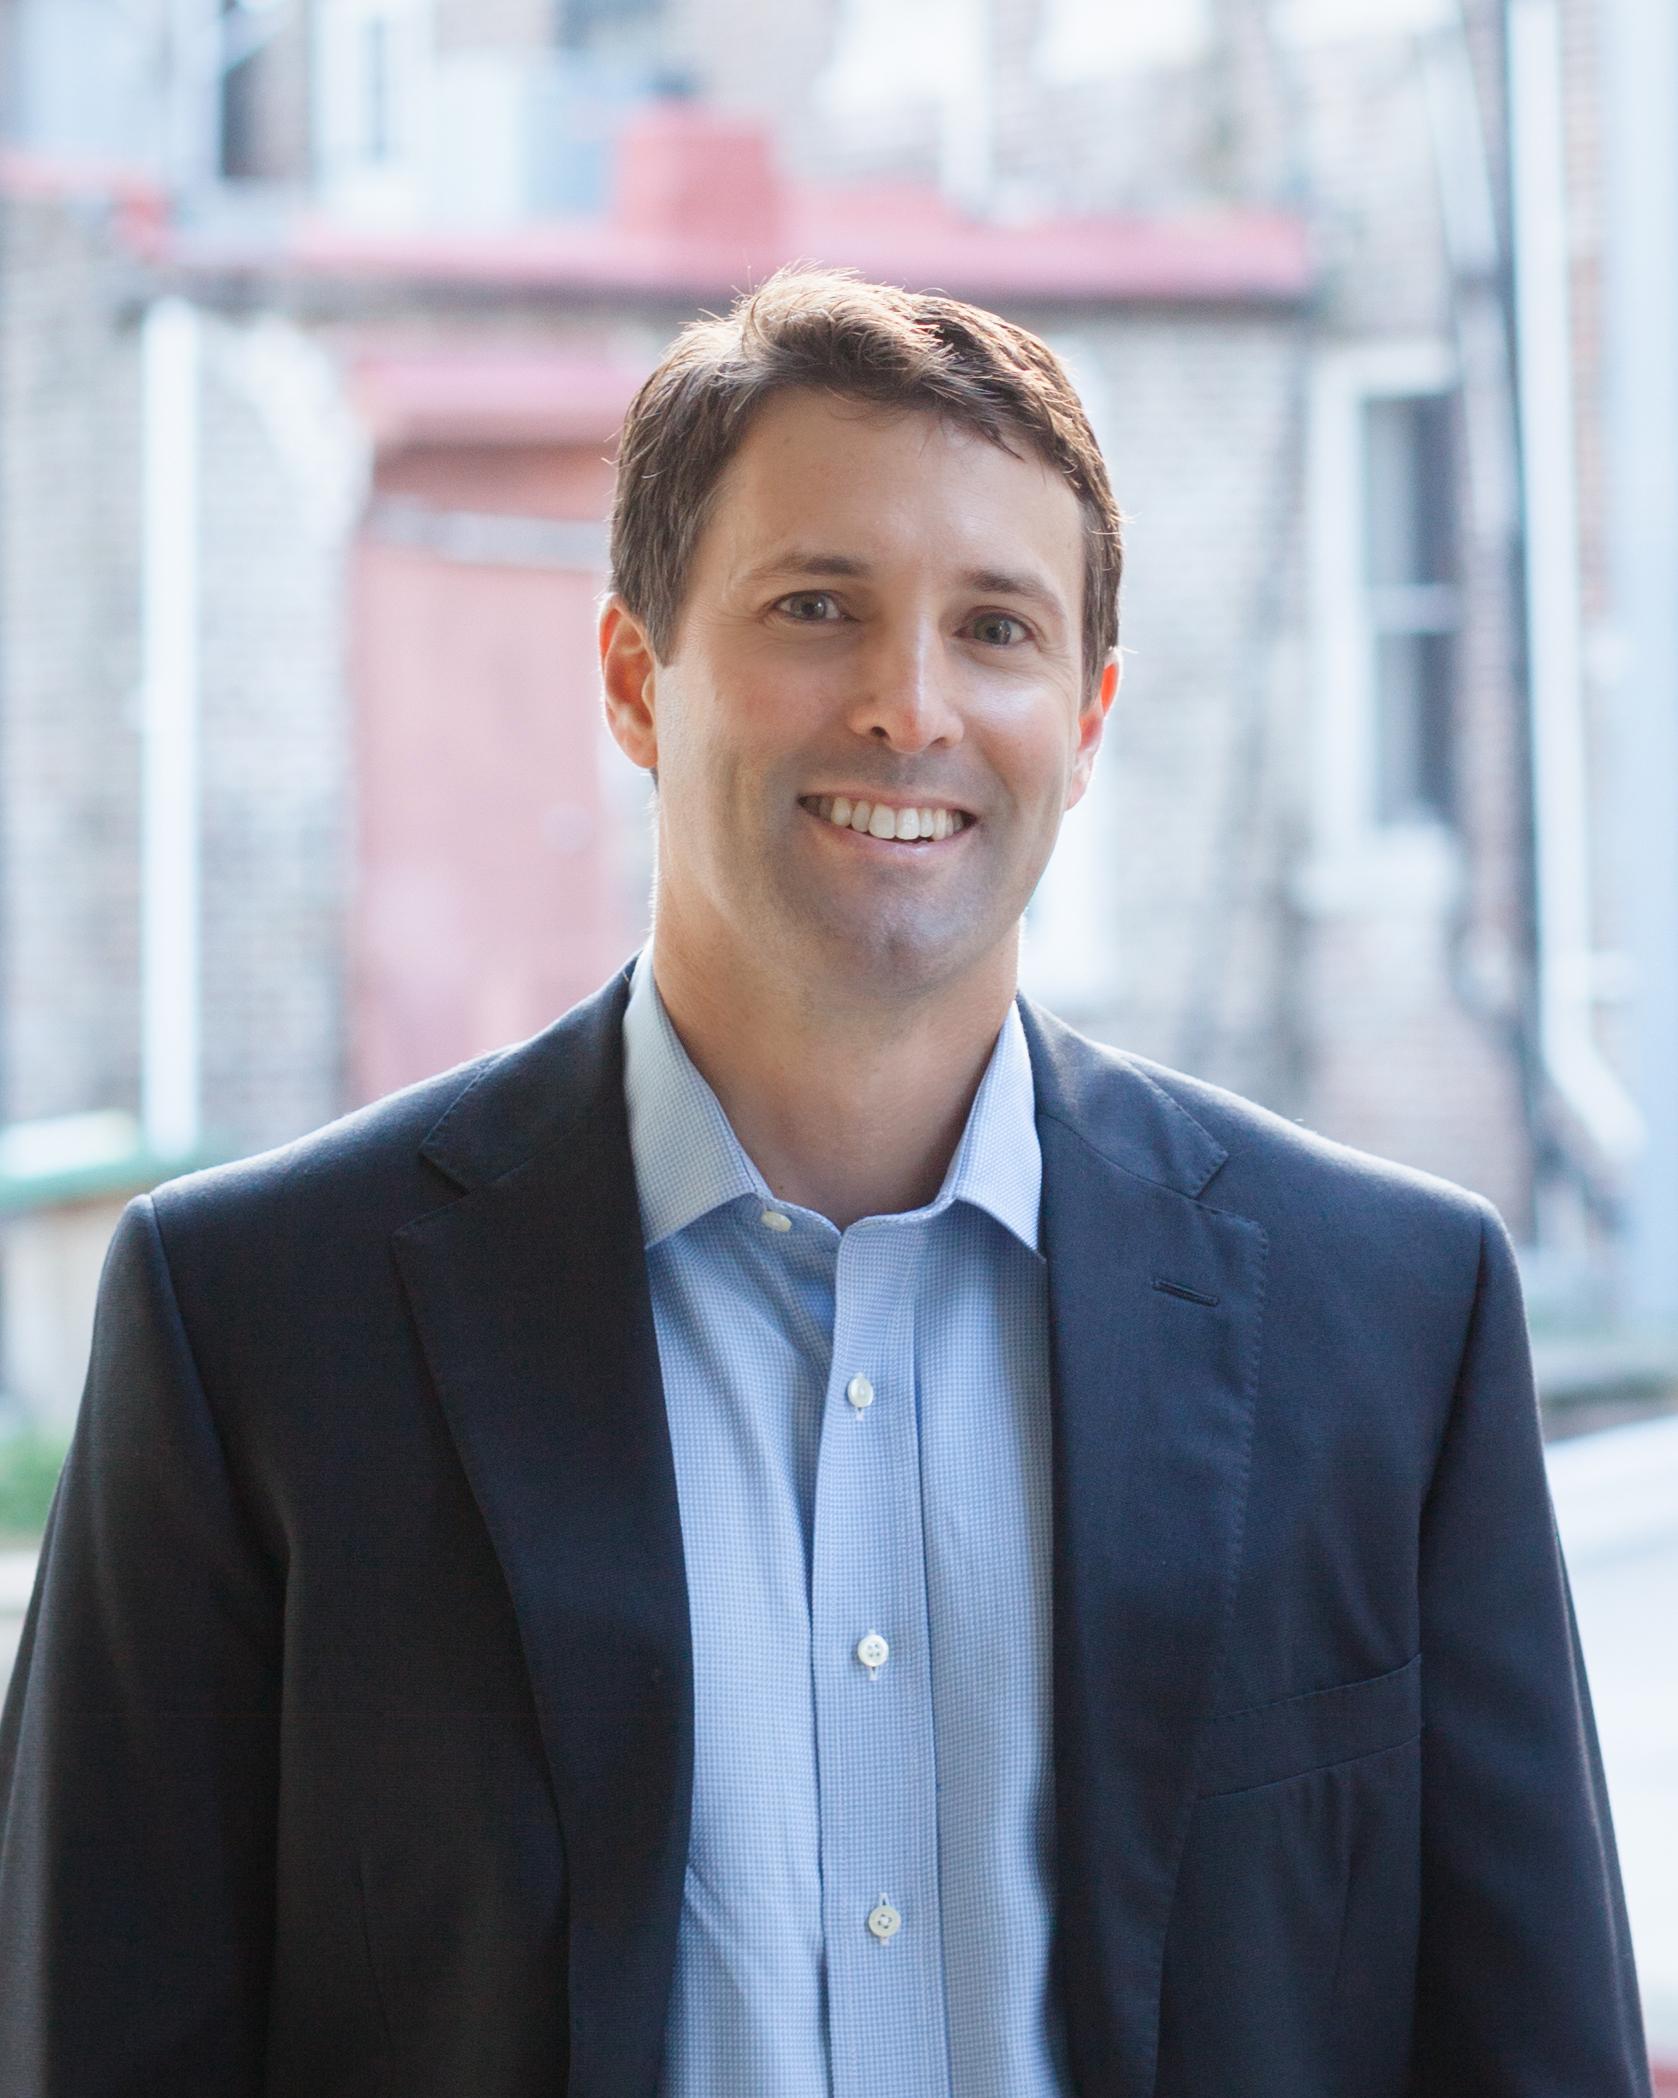 Dr. David Geier